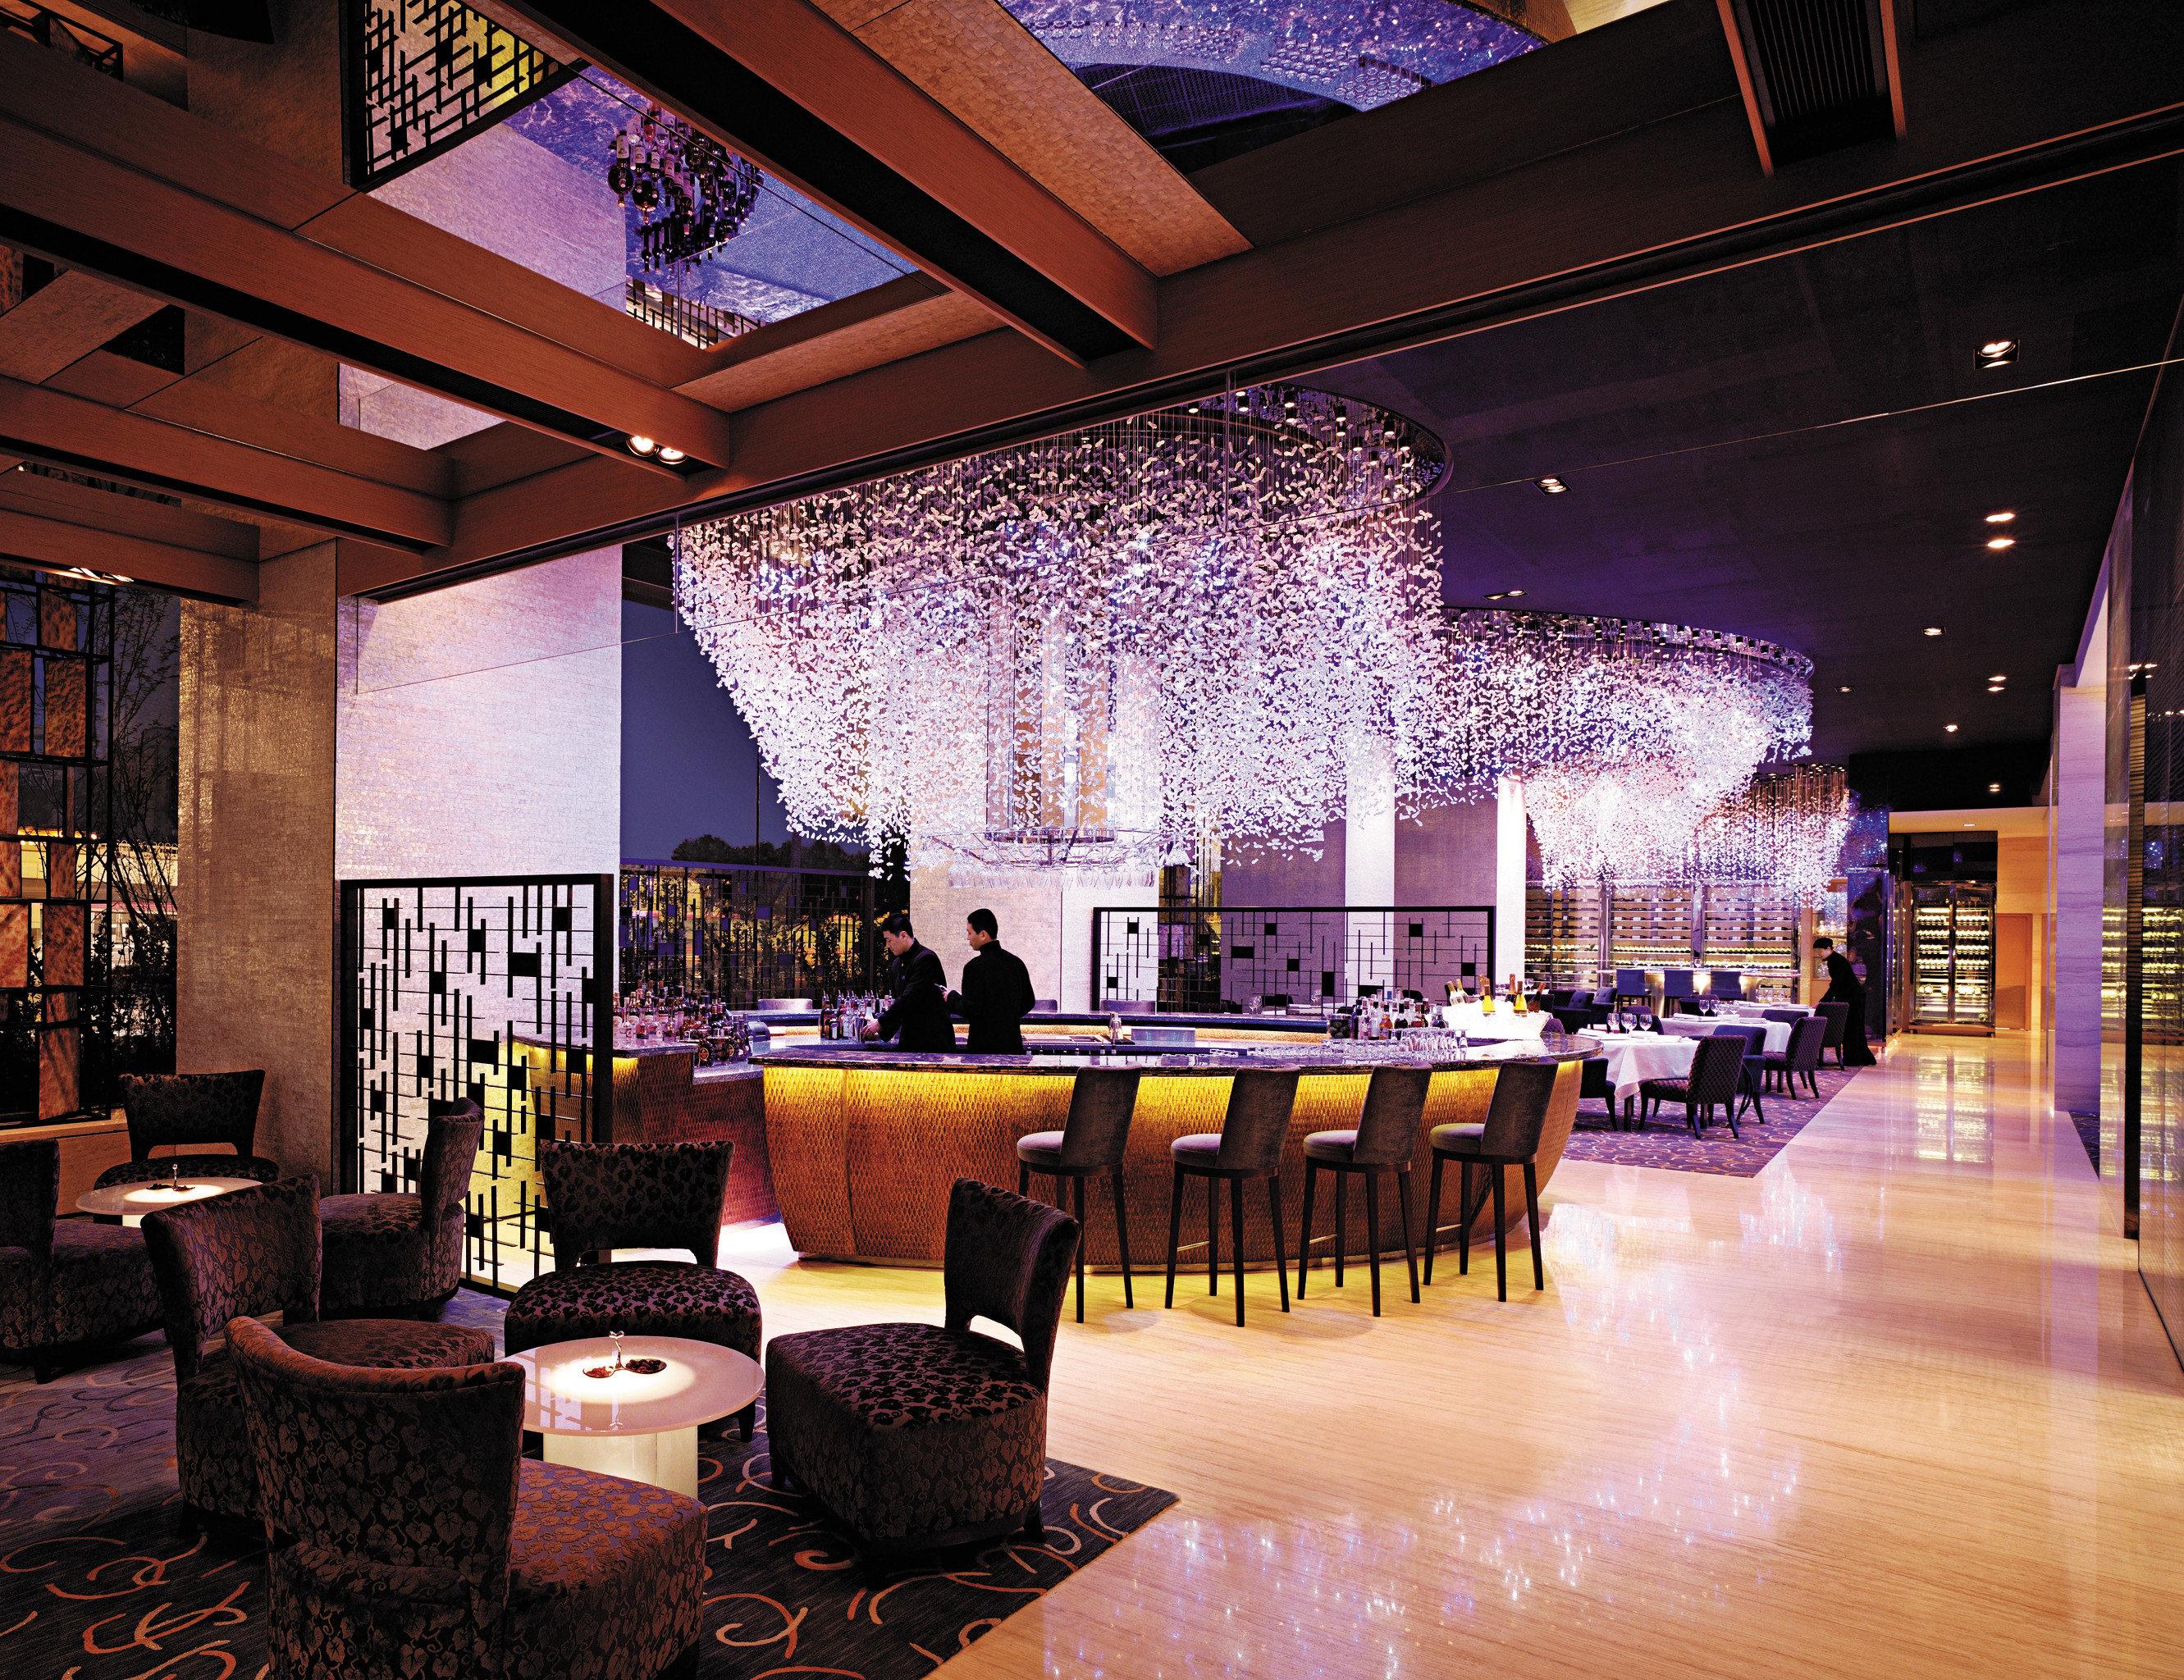 Dining Drink Eat Elegant Luxury Modern chair Lobby function hall restaurant Bar ballroom